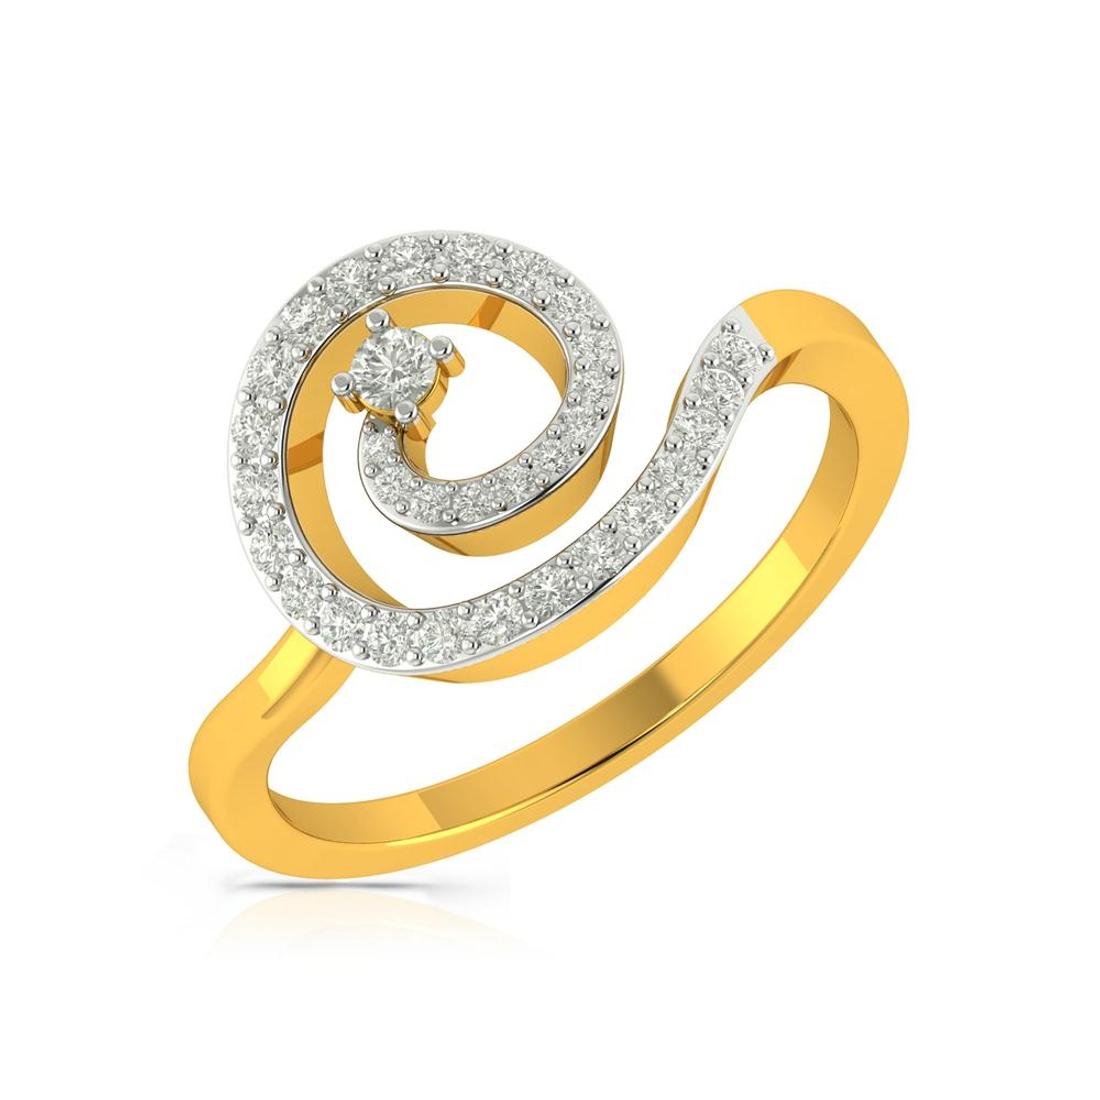 Buy Charu Jewels Diamond Ladies Ring CJLR0350 Online in India